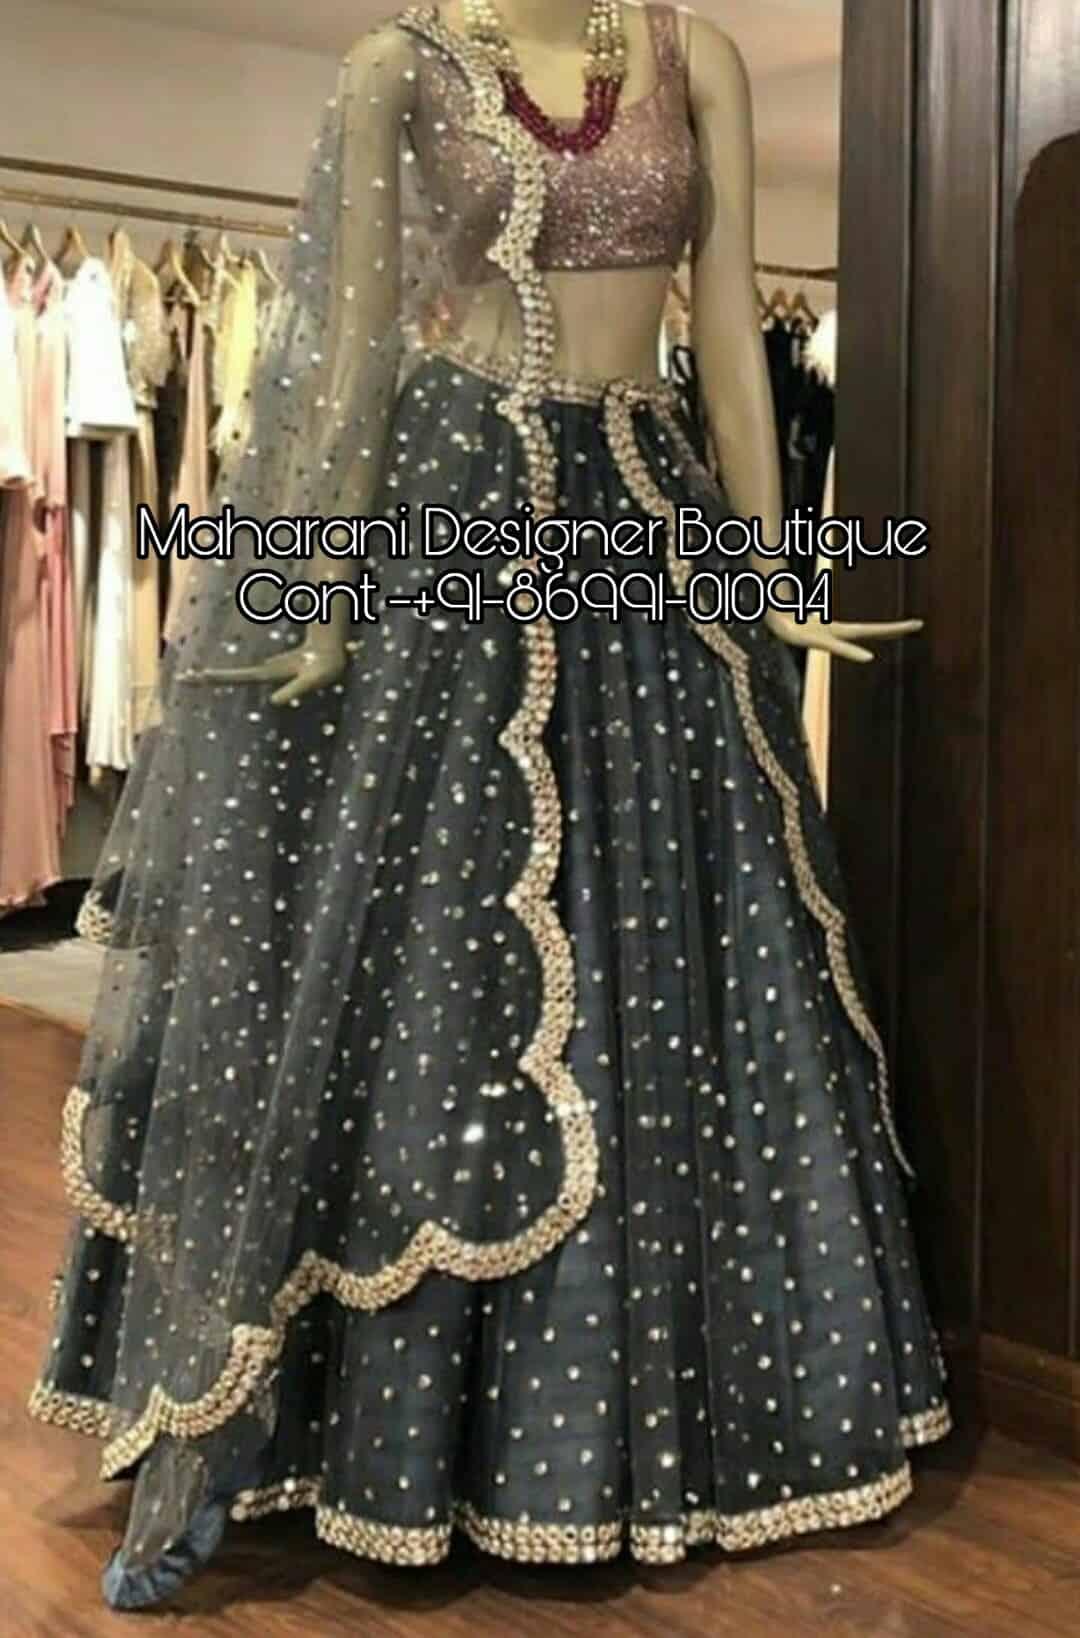 a8bc255fee Boutique Style Lehenga Choli, lehenga choli boutique online, boutiques in  india, lashkara boutique